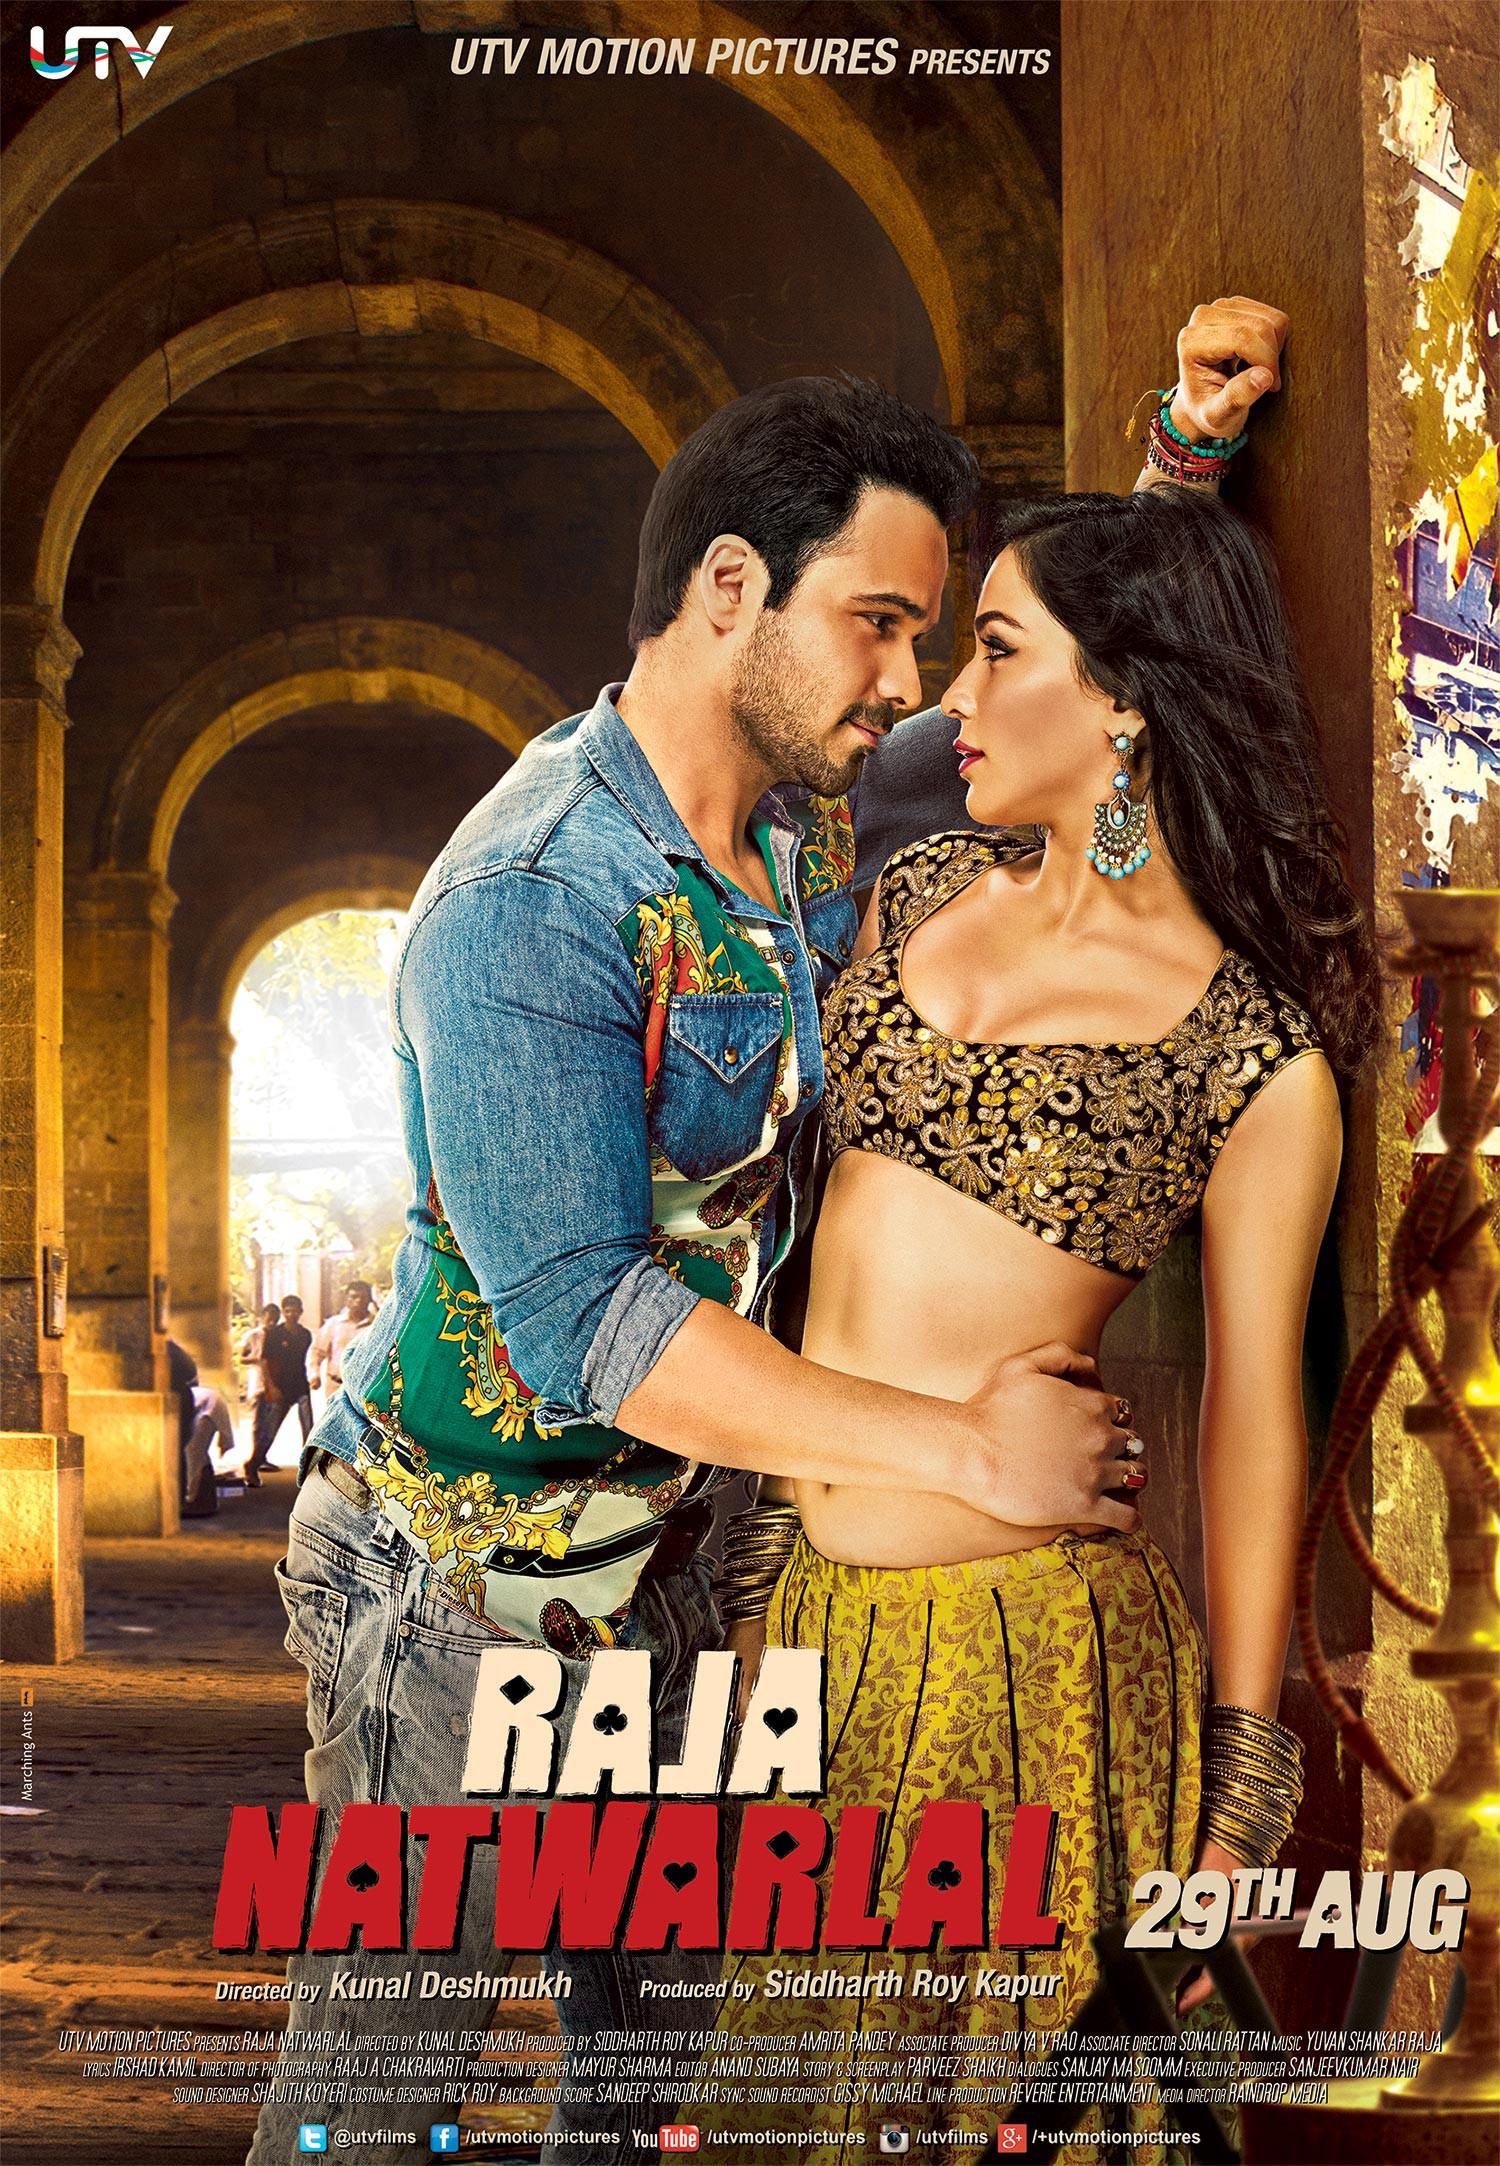 Natwarlal (2014) Hindi Full Movie 480p, 720p Download